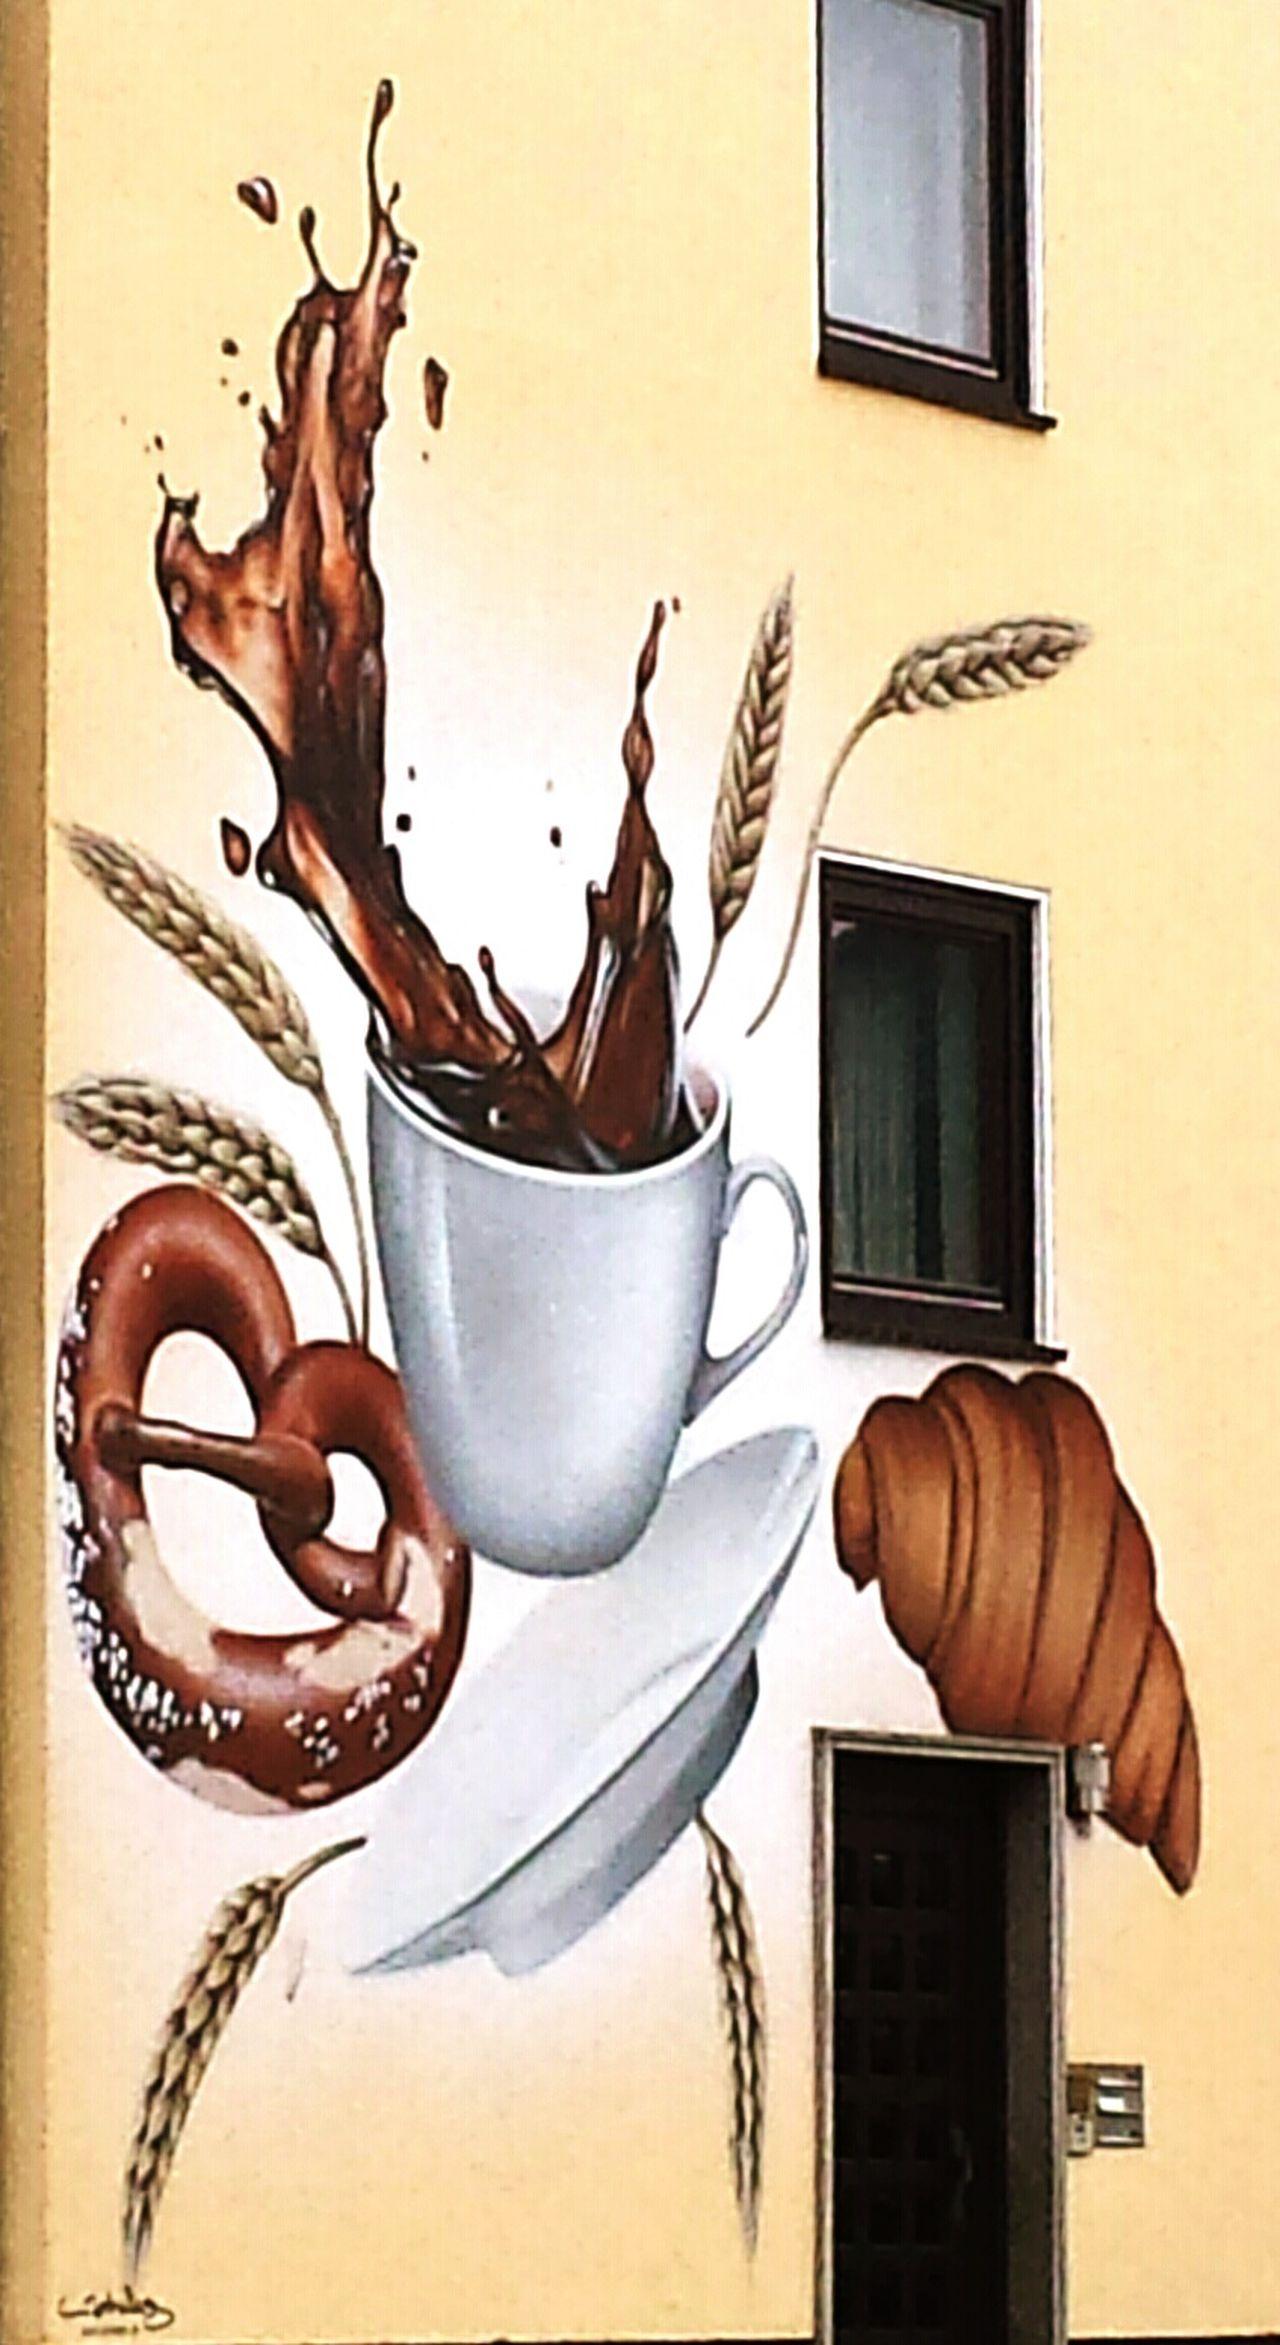 Liquid Lunch Koffee Grafitti